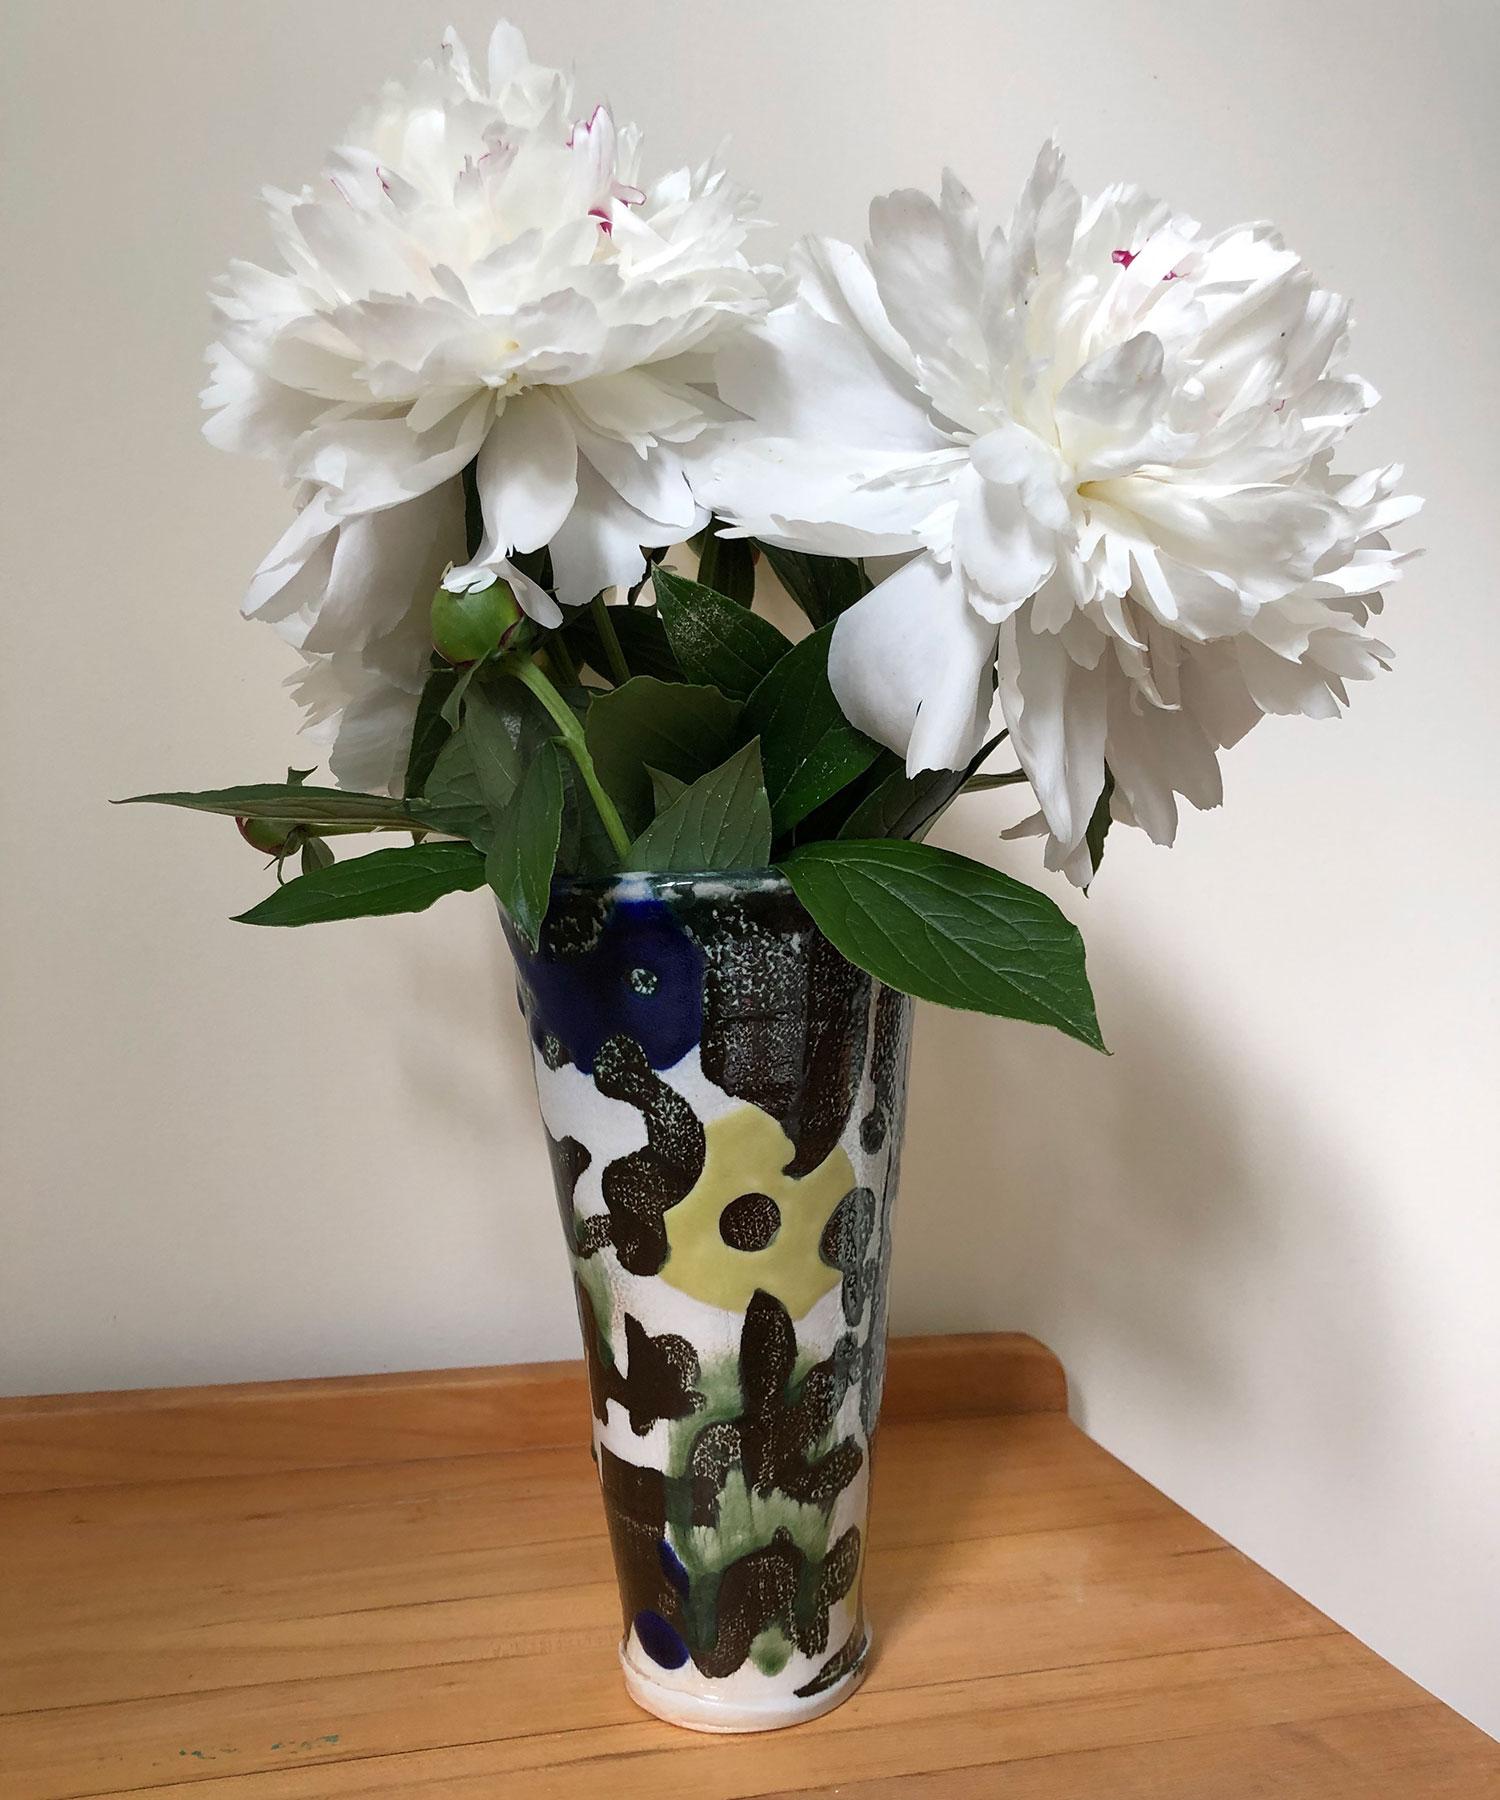 holly_hughes_other_ceramics_vase_peonies_site.jpg